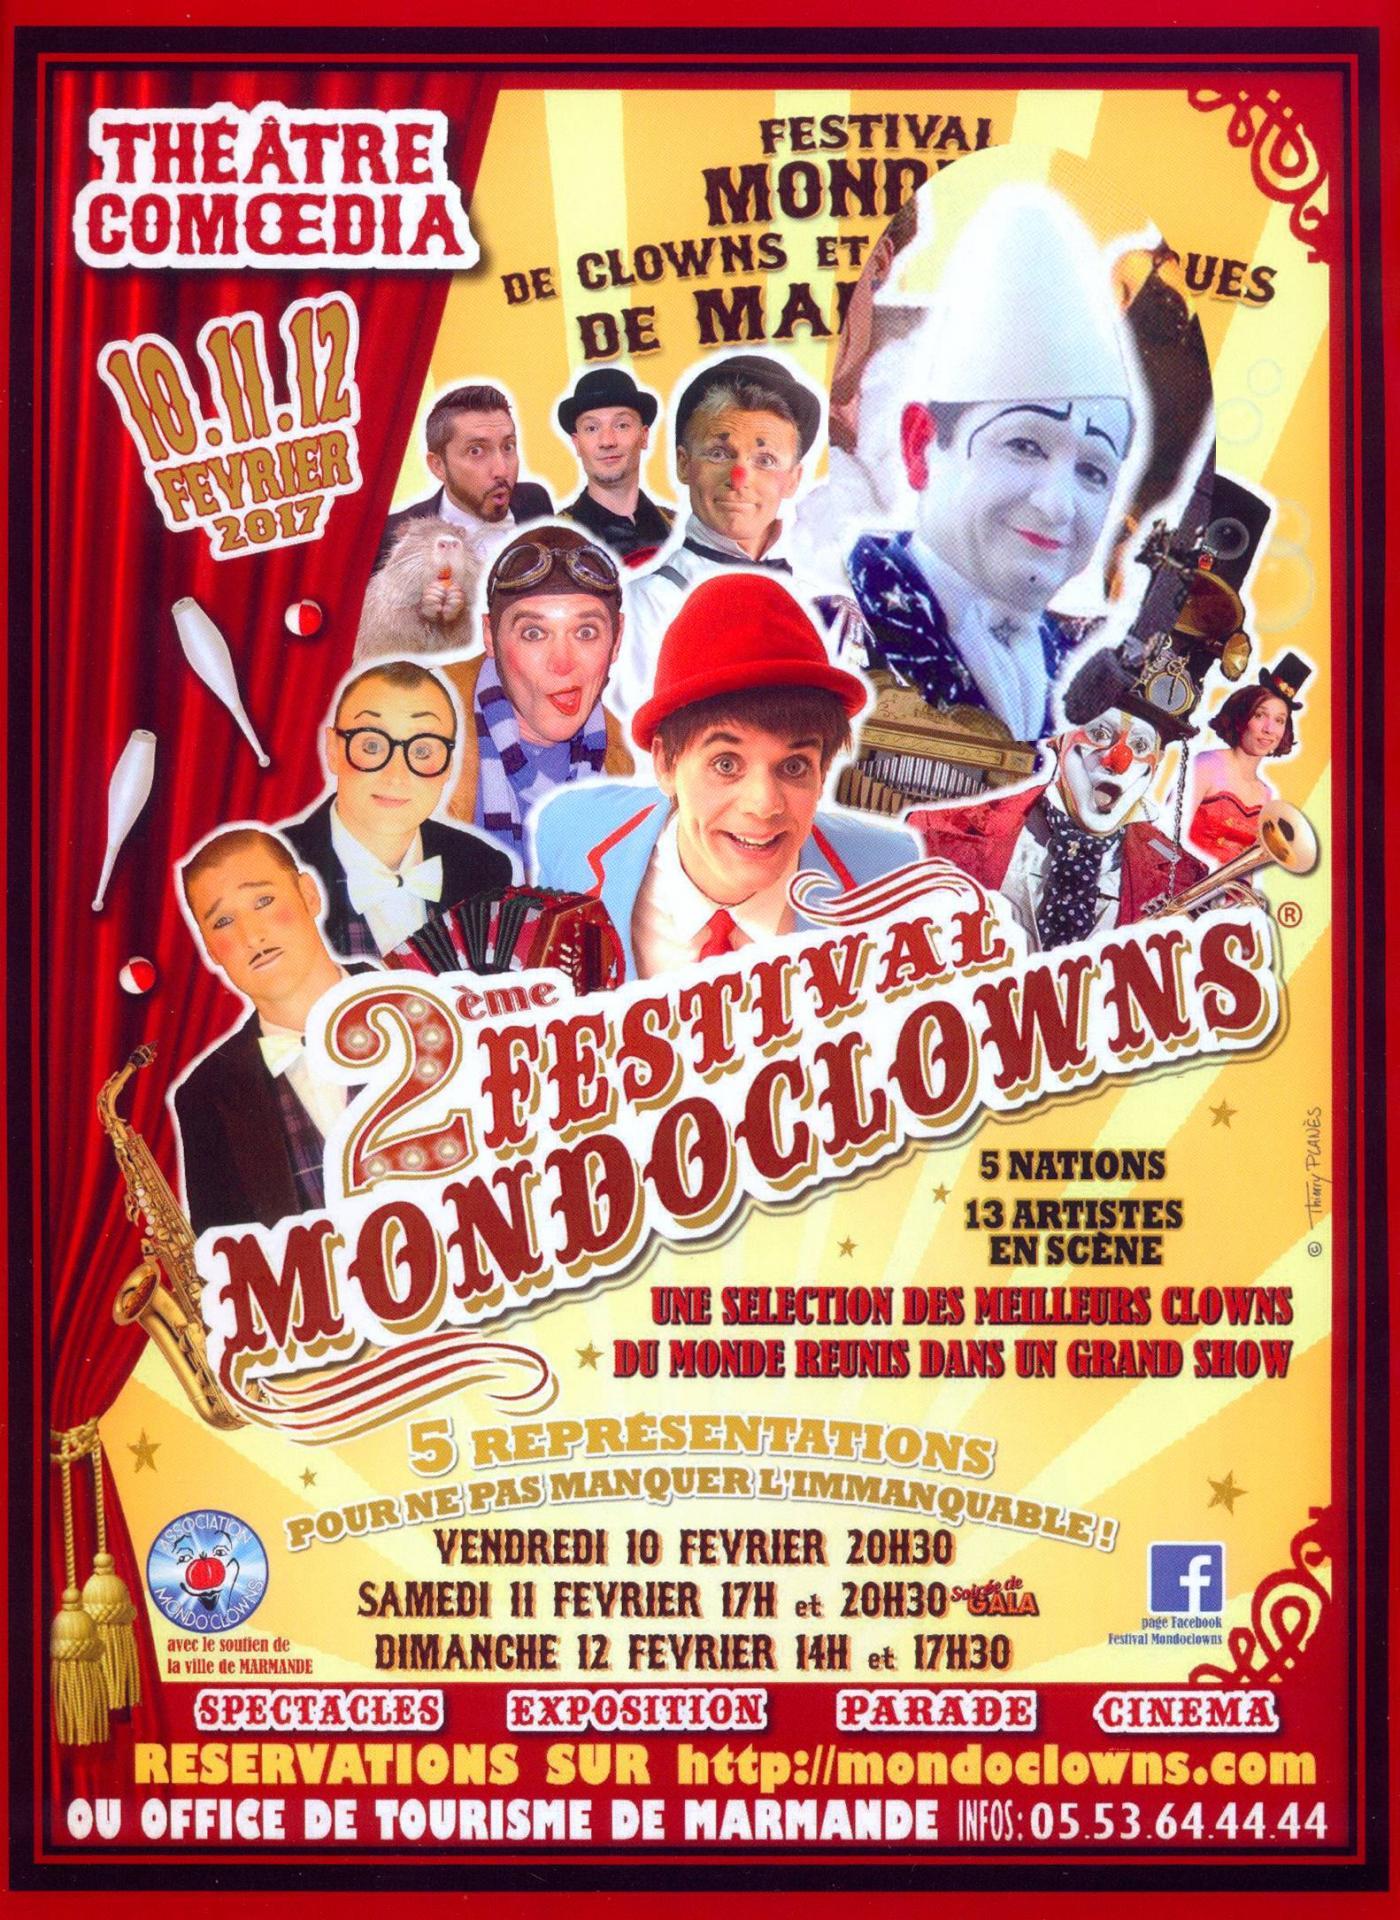 Mondoclown 2 2016